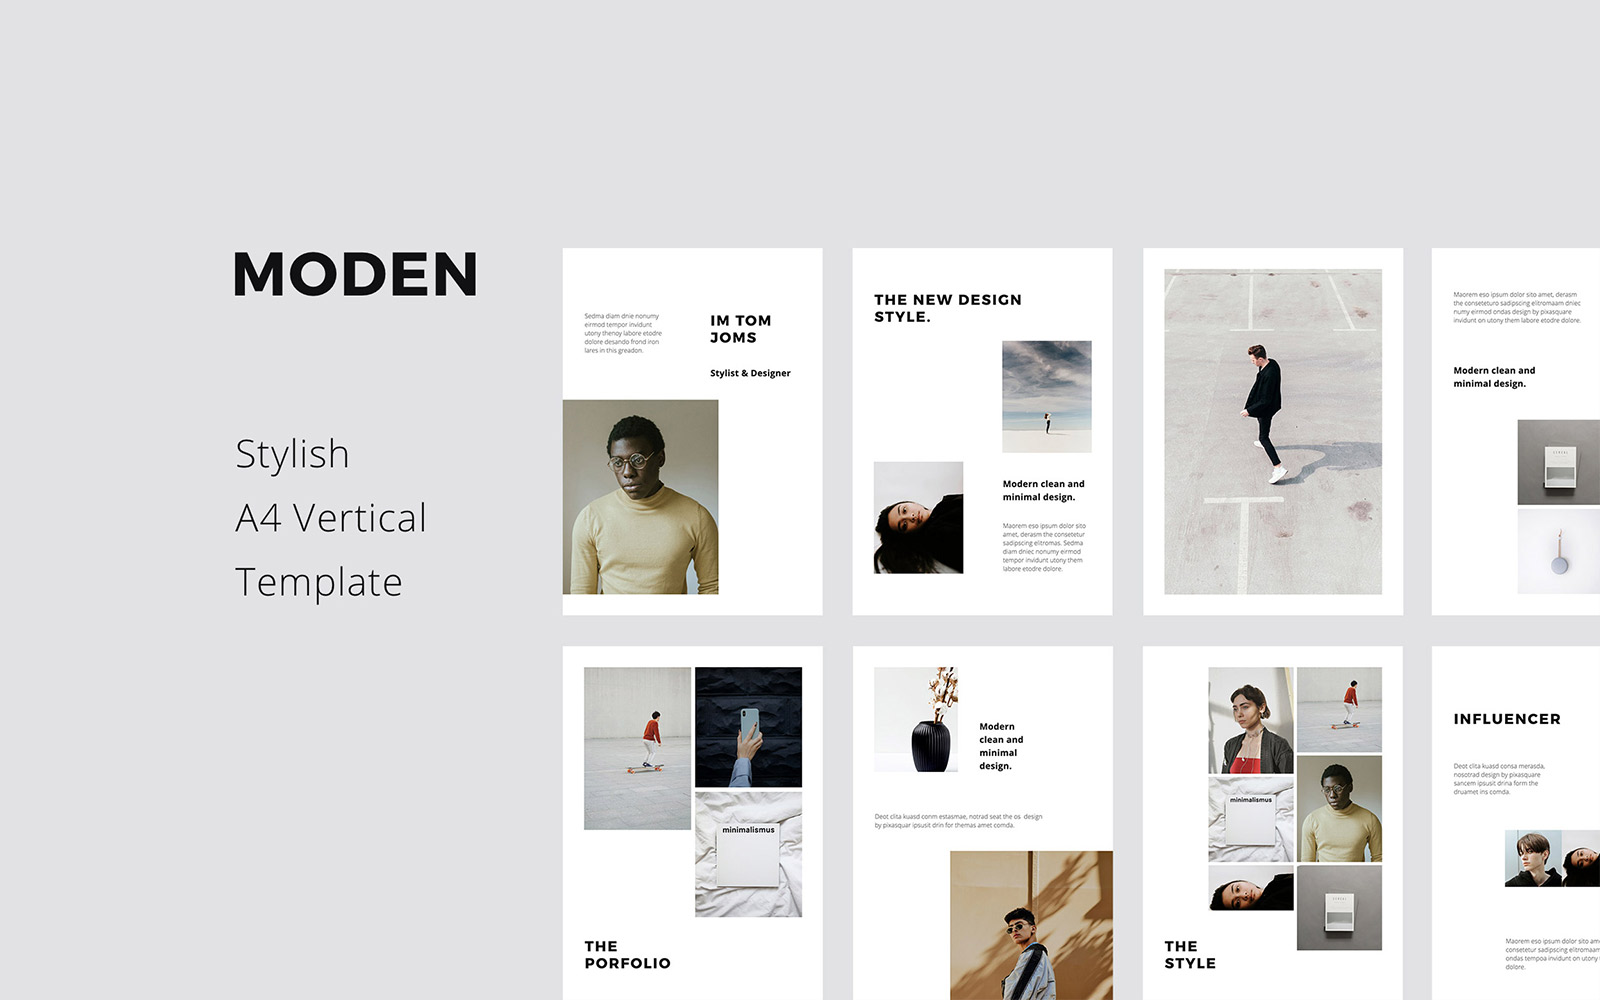 MODEN - A4 Vertical Style Google Slides